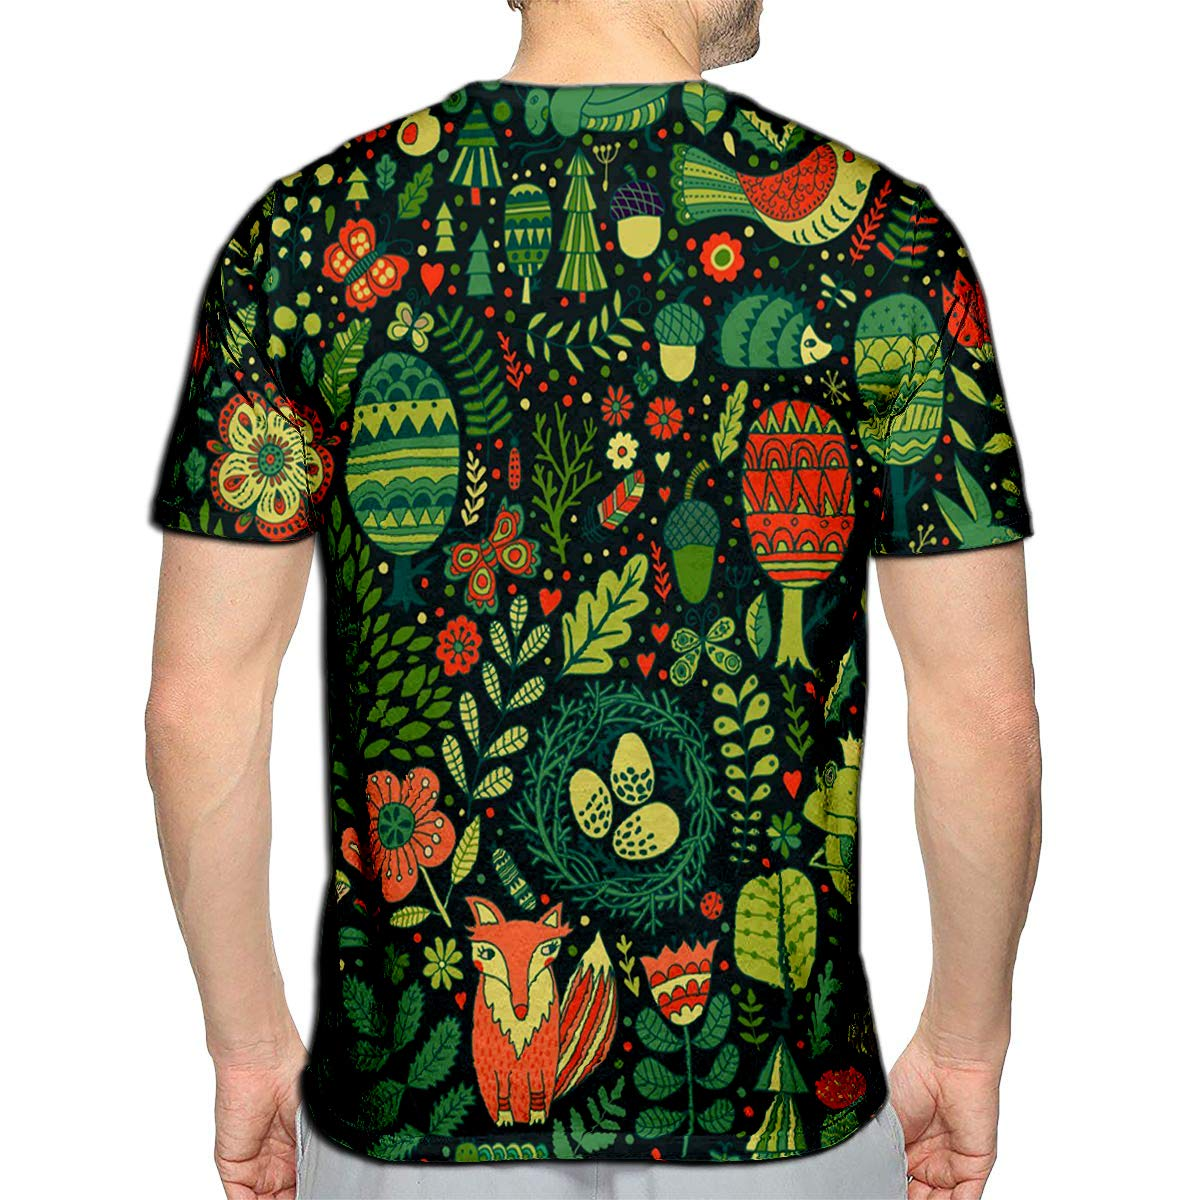 3D Printed T-Shirts Forest Design Floral Animals Frog Fox Owl Rabbit Hedgehog Sh